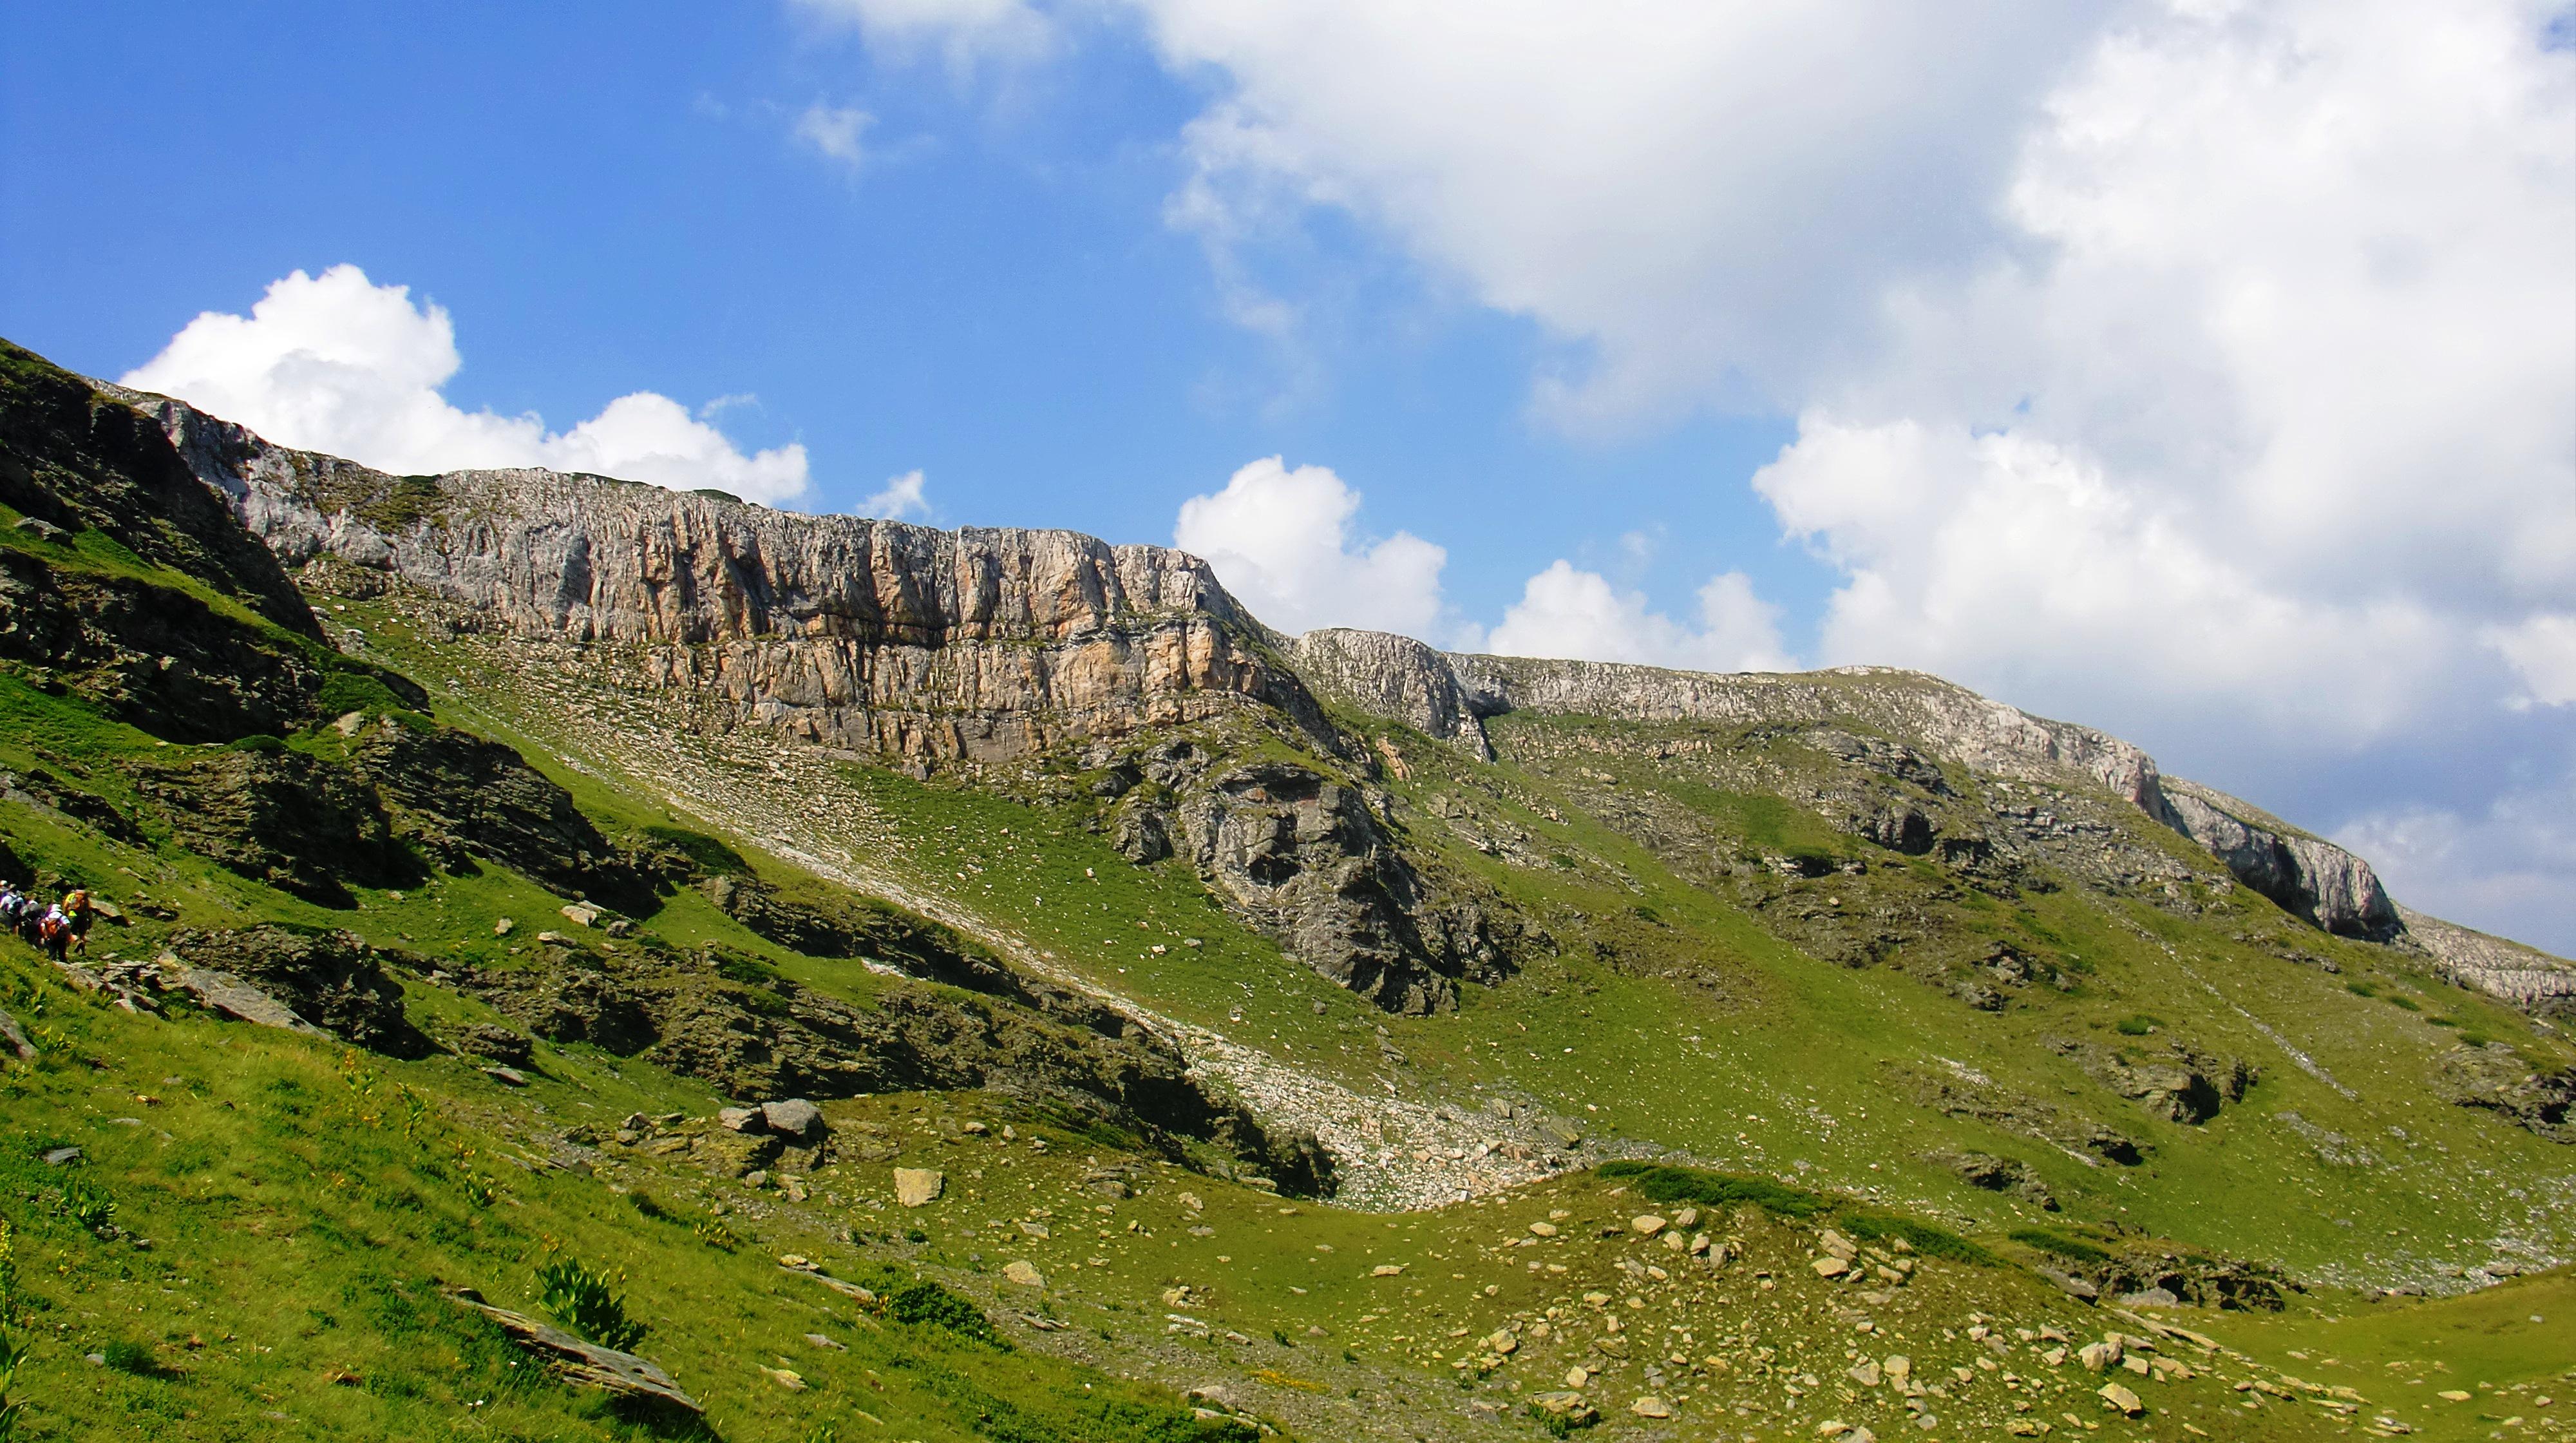 mountain and the greenary - photo #9